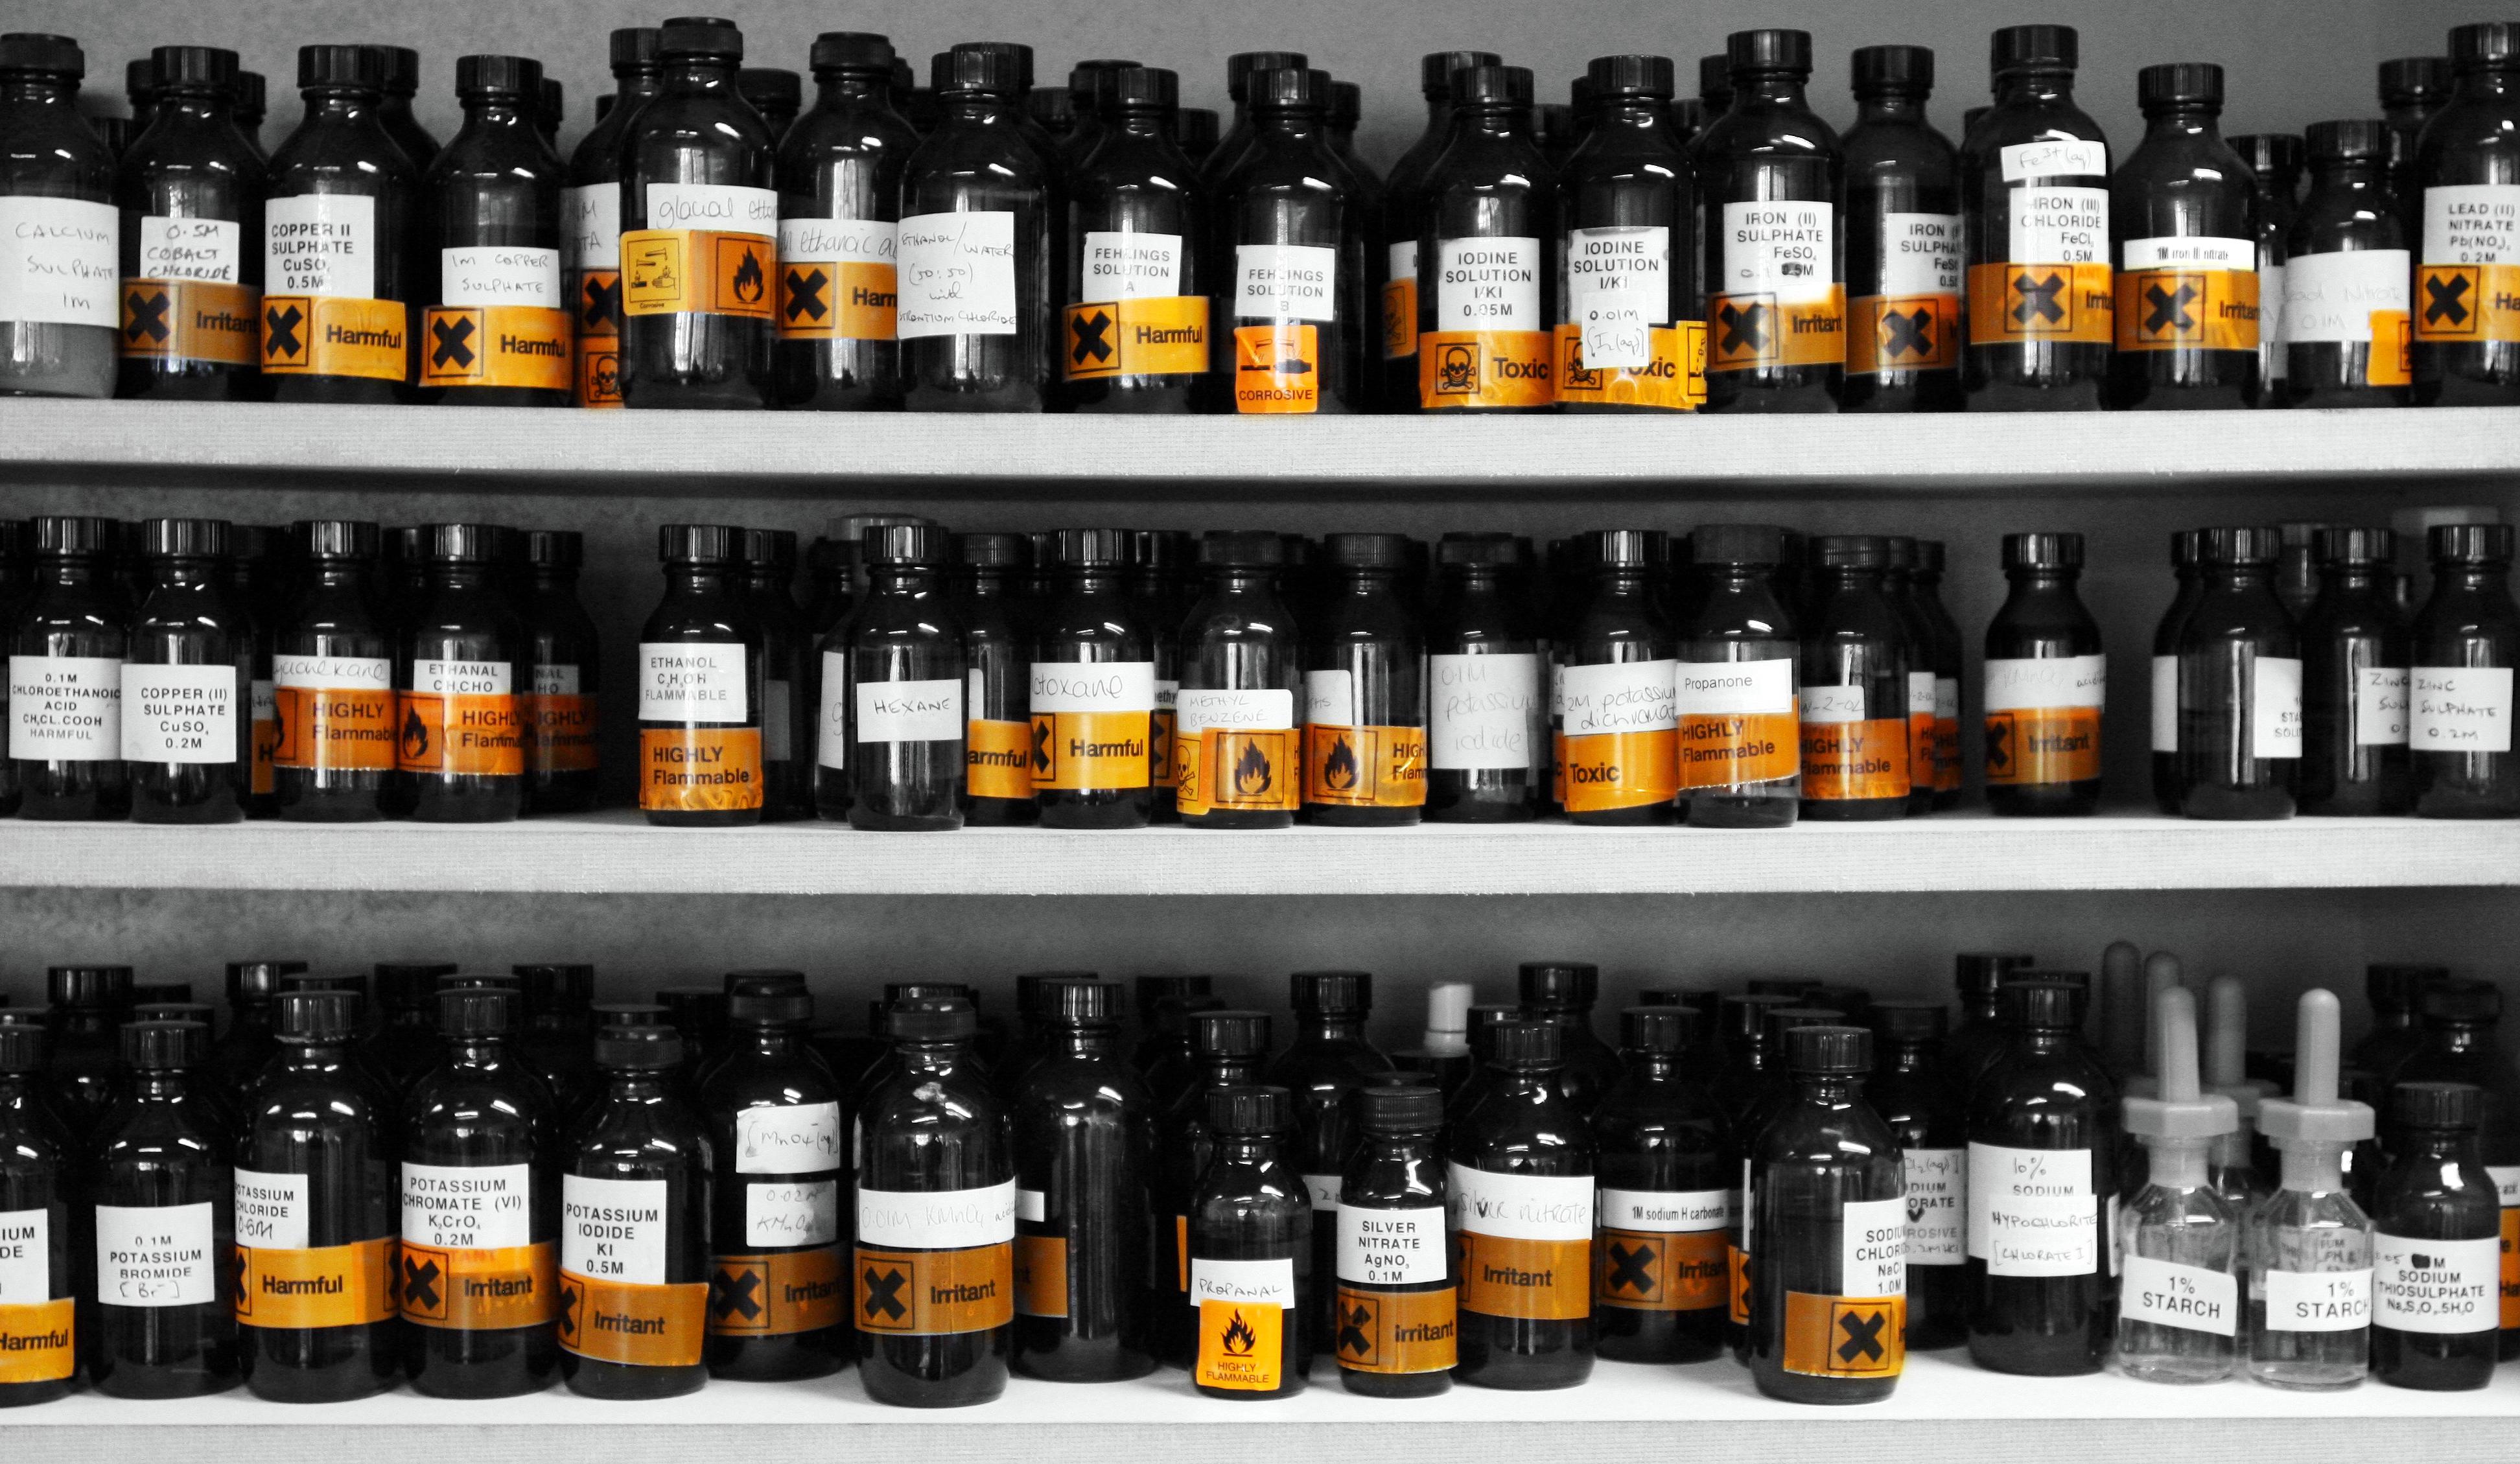 File:I Heart Small Bottles of Chemicals 4890752060.jpg